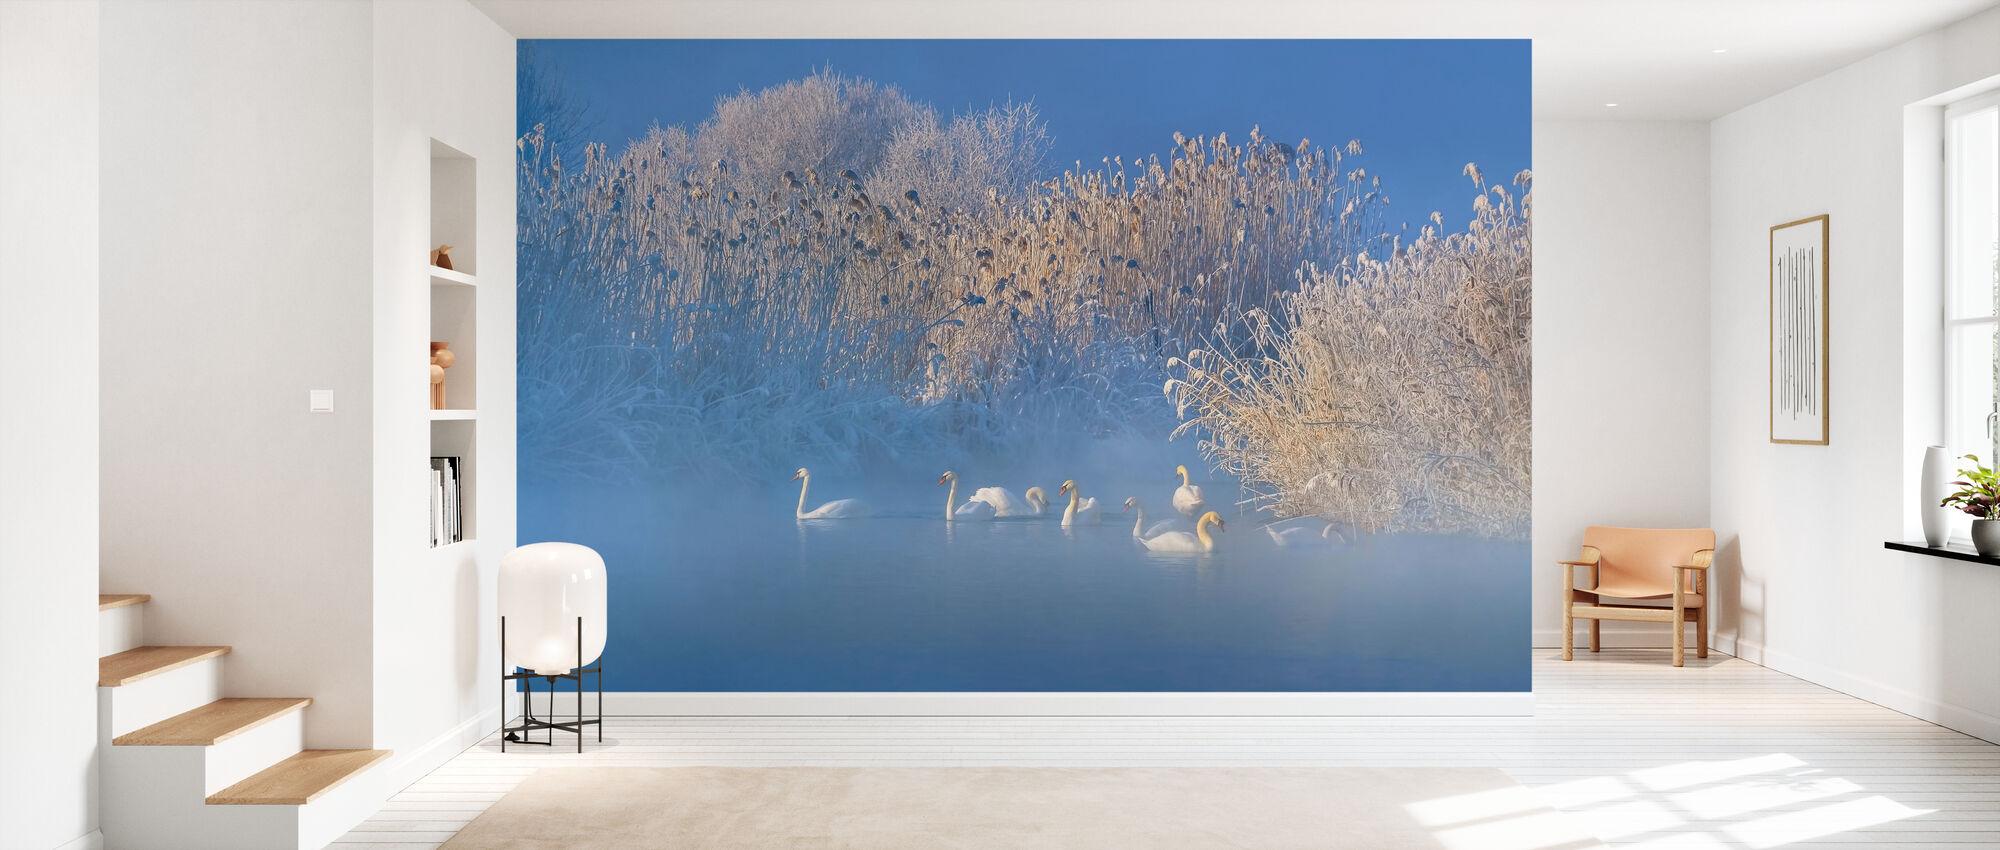 Blue Swan Lake - Wallpaper - Hallway